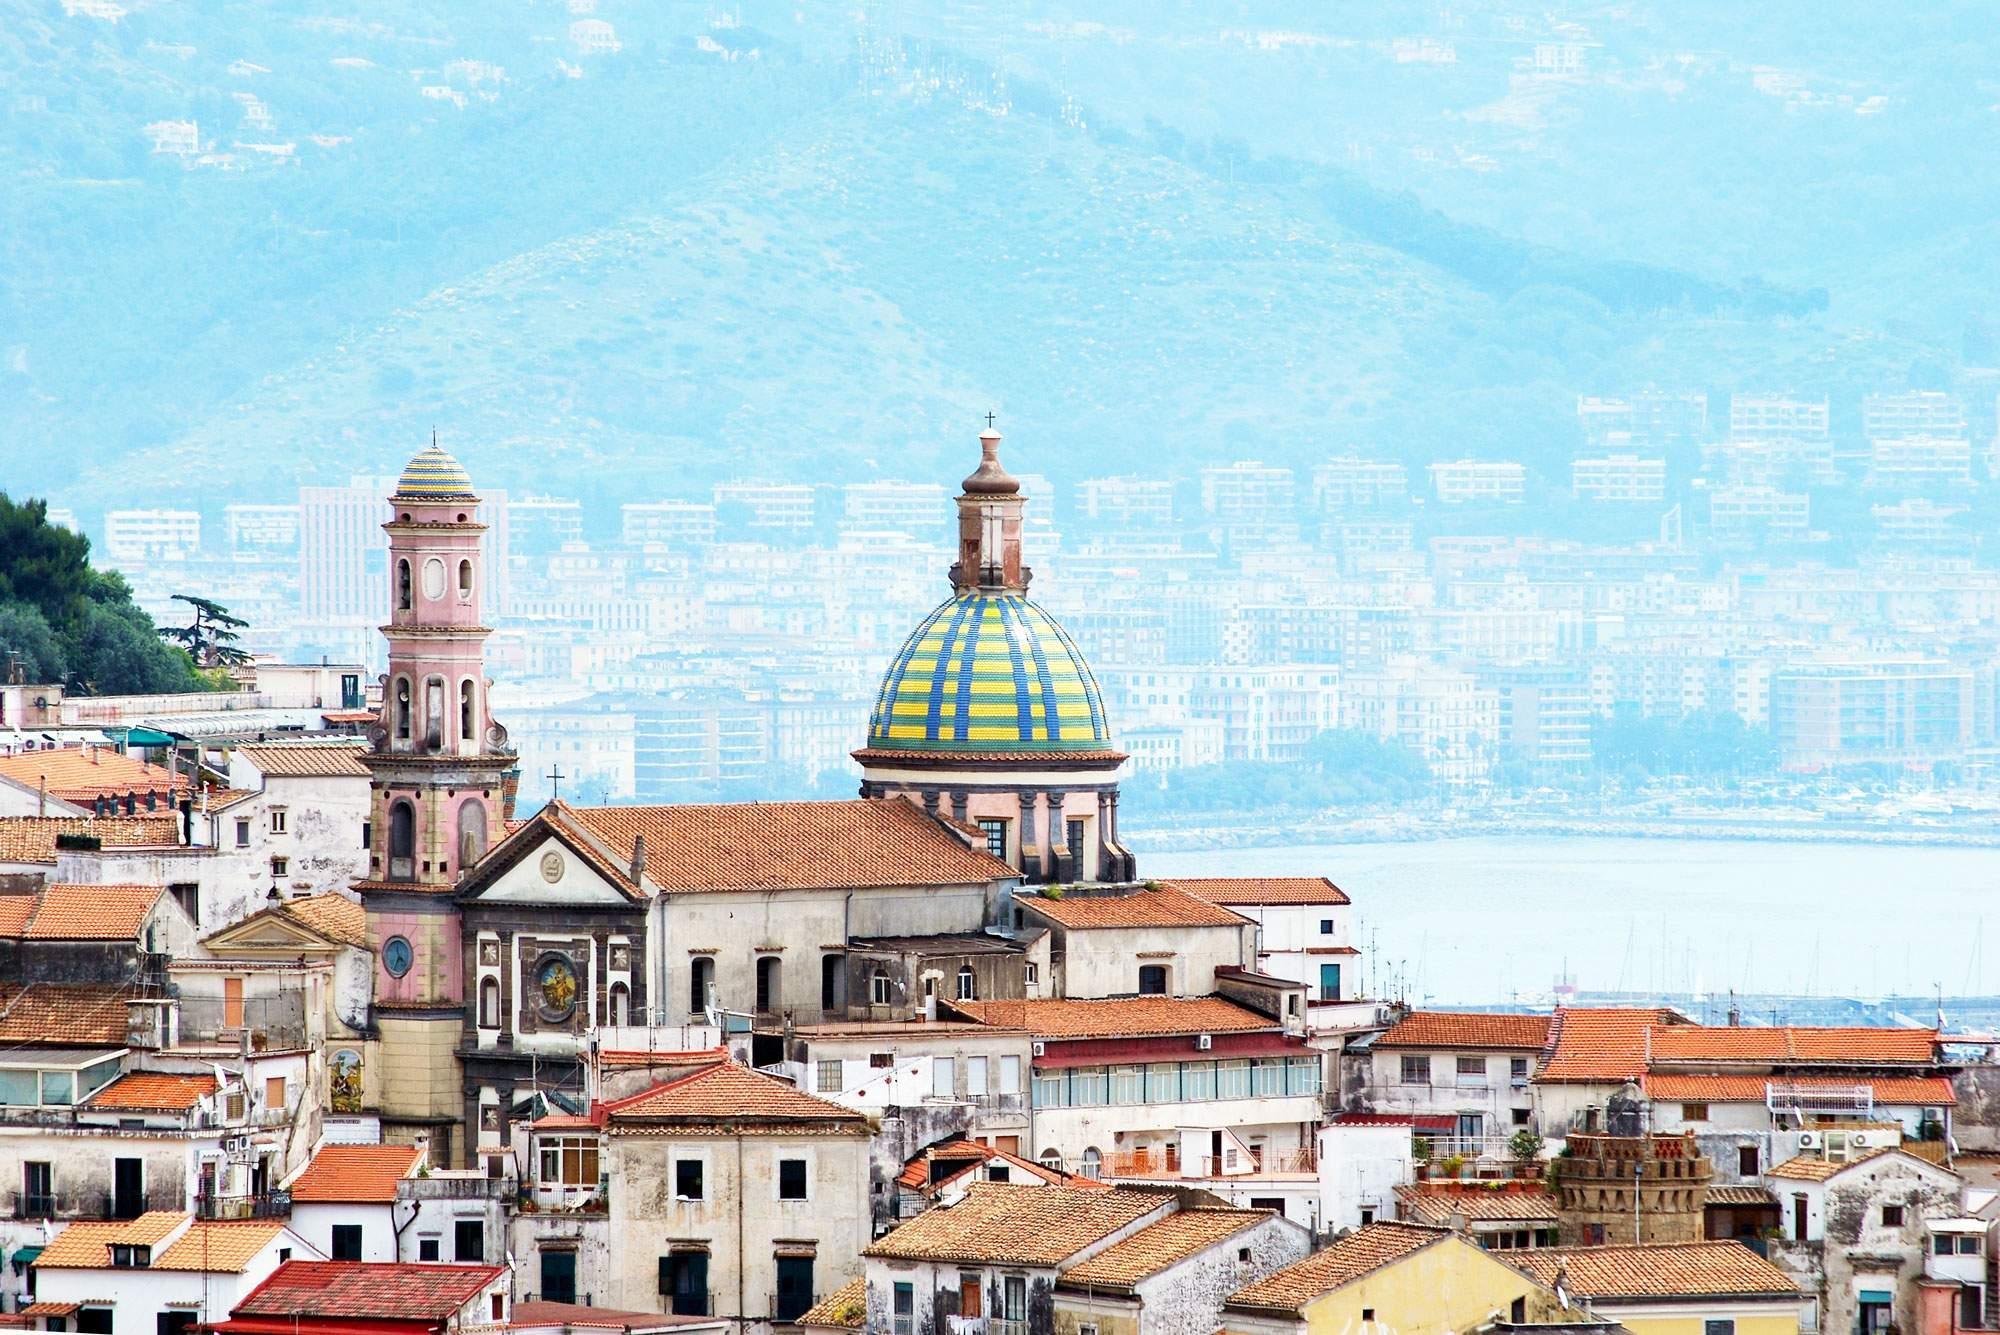 vietri-sul-mare-amalfi-coast-italy-town-seaview